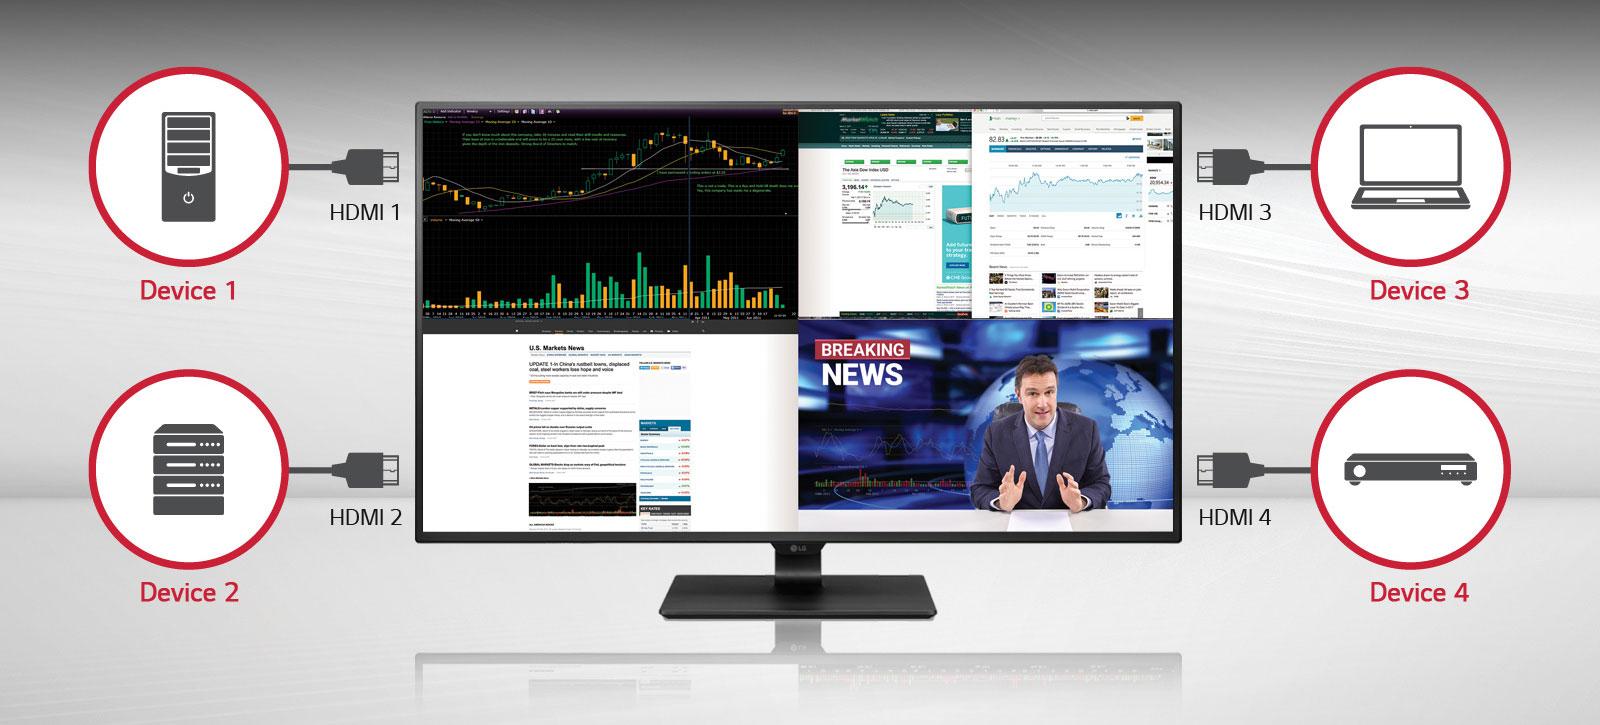 LG_UHD_4K_Monitor_Video_Thu-1.jpg